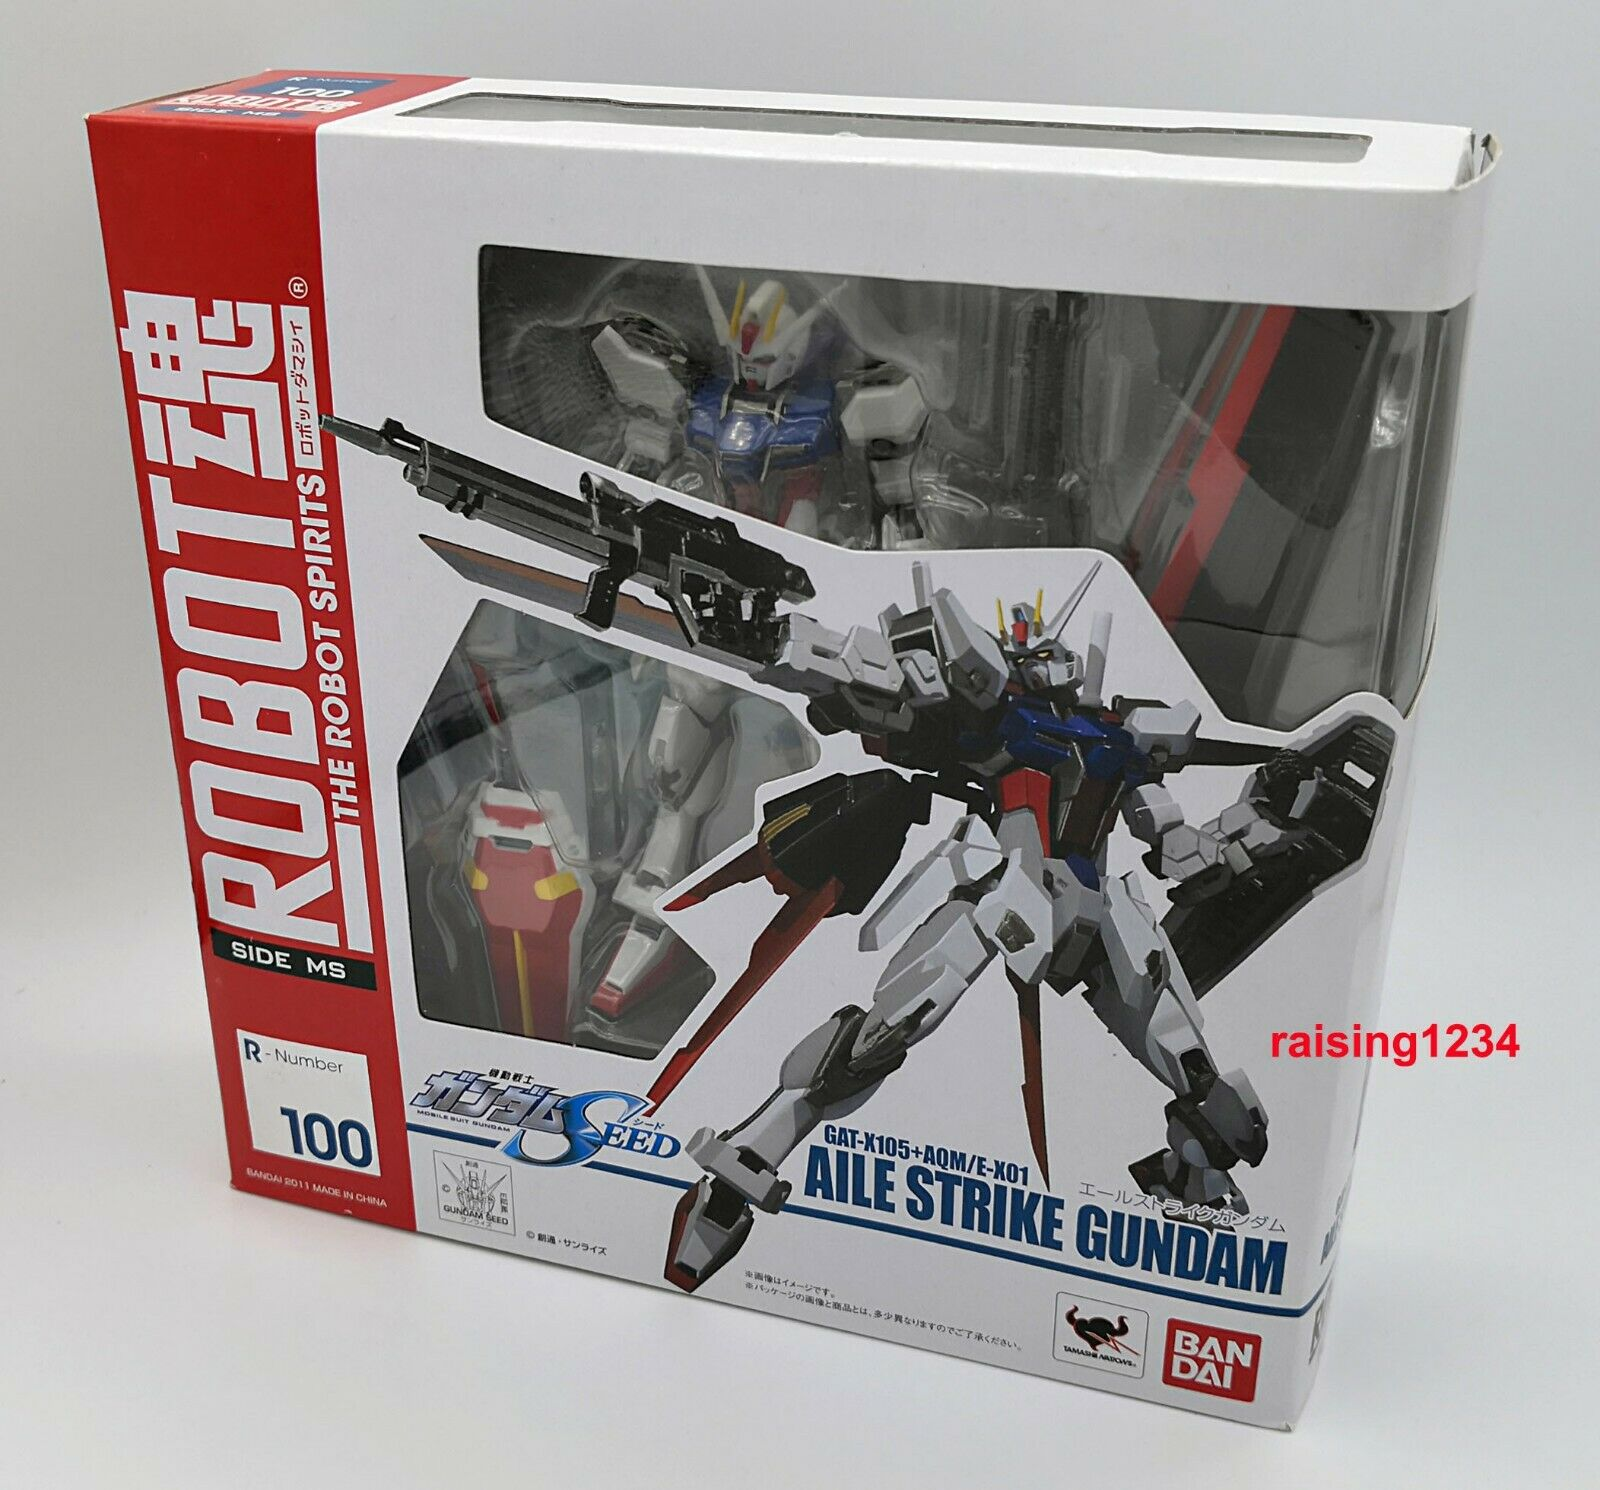 Mobile Suit Gundam Seed Aile Strike Beai Robot Spirits 100  azione cifra  Nuova lista